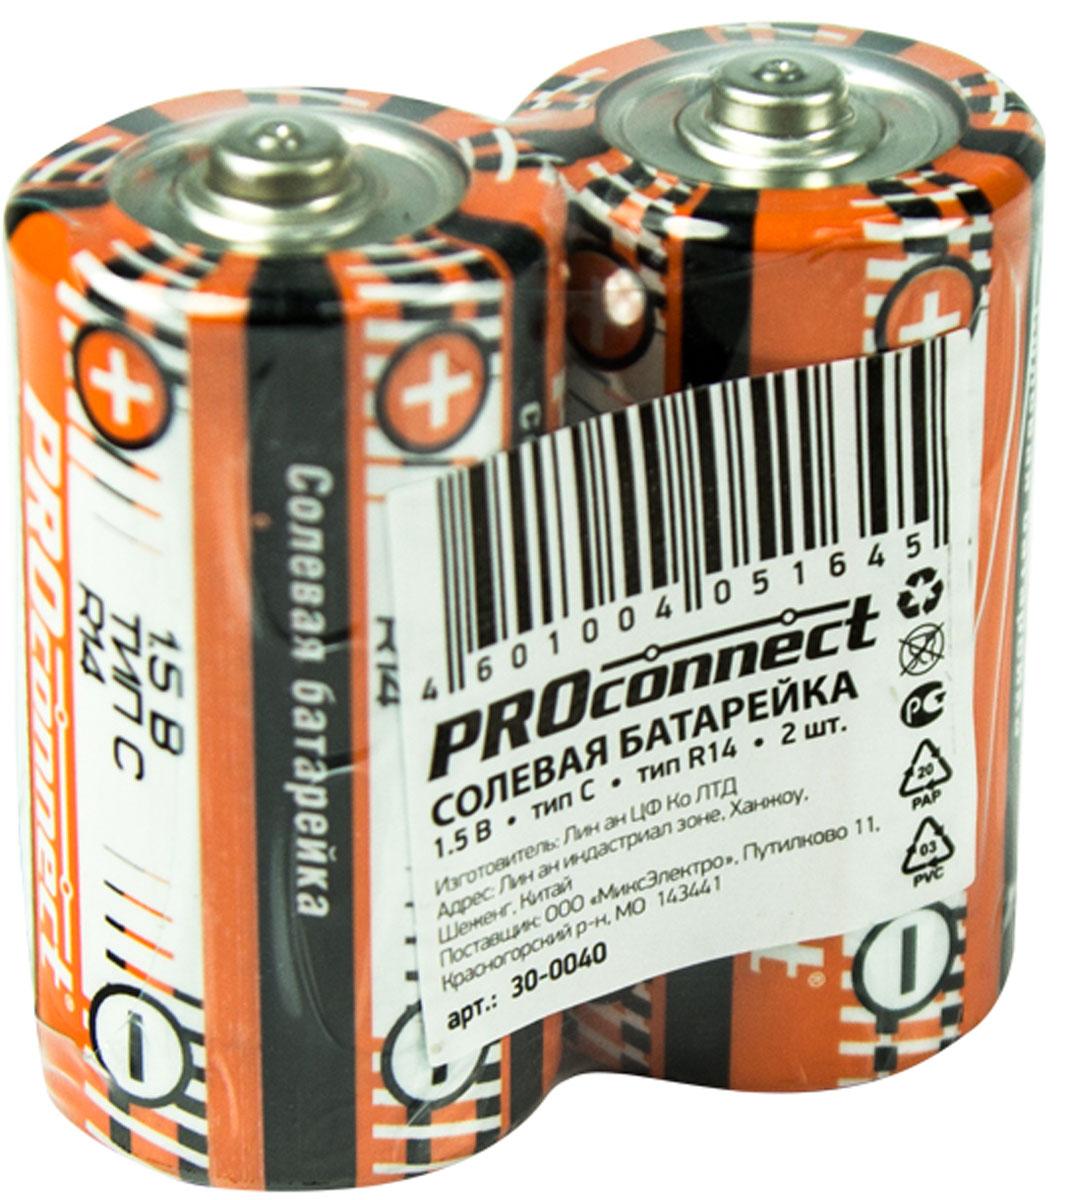 Батарейка солевая PROconnect, тип С-R14, 2 шт energizer батарейка солевая eveready r14 тип c 2шт